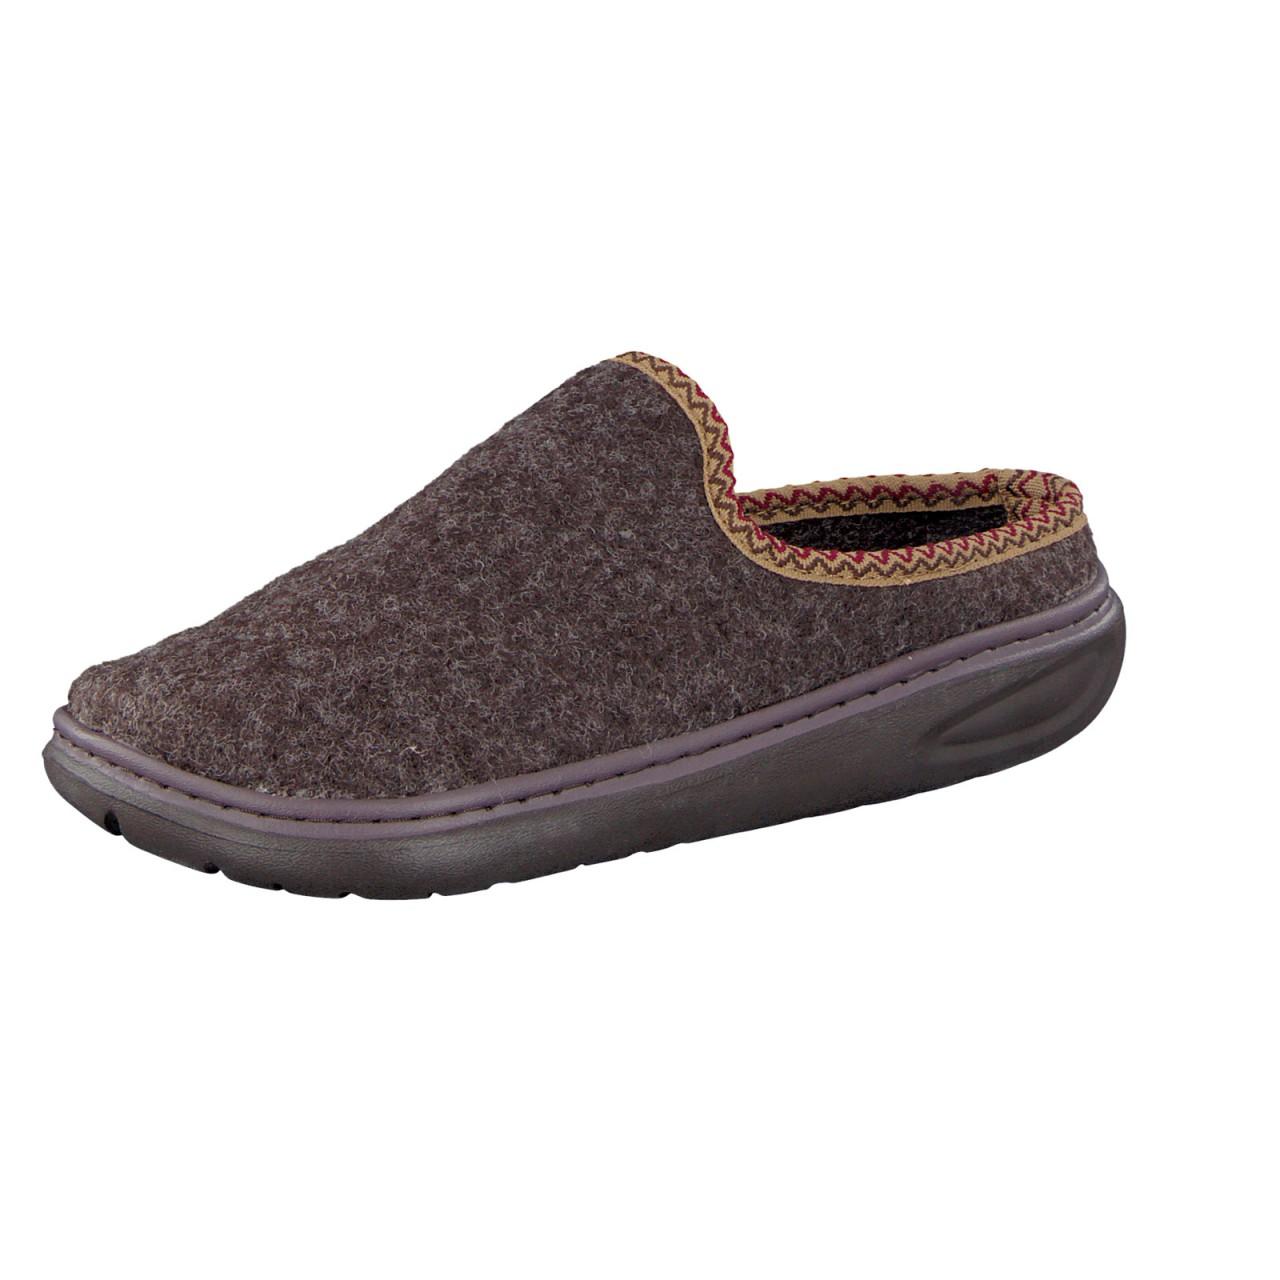 6265f87663 Wellness Comfort Femmes Super Soft Comfort pantoufles + brun